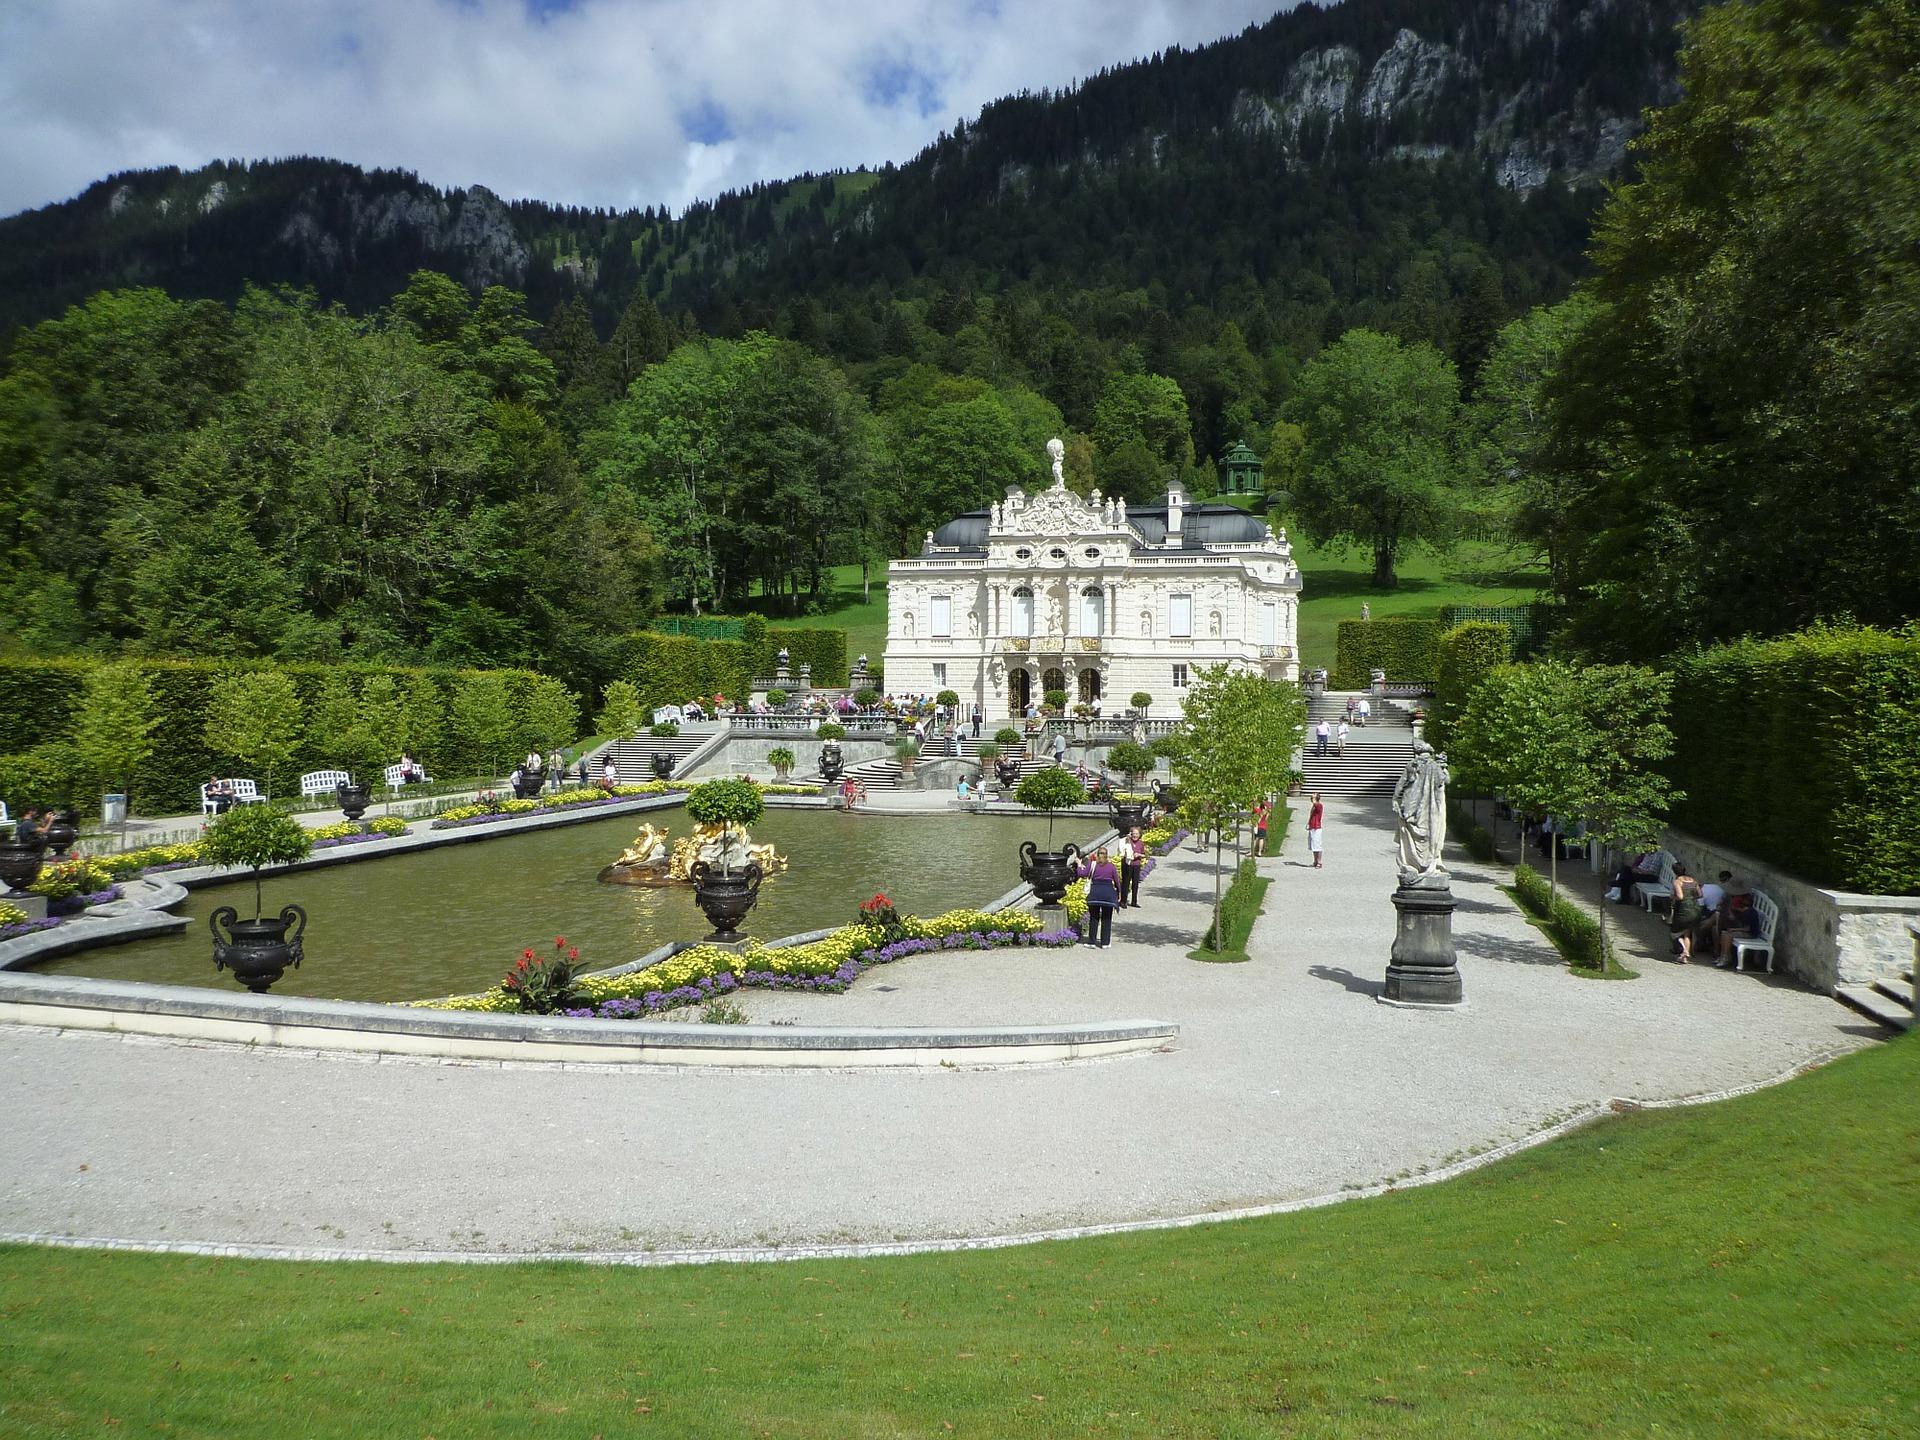 linderhof-chateau-baviere.jpg?1543154236